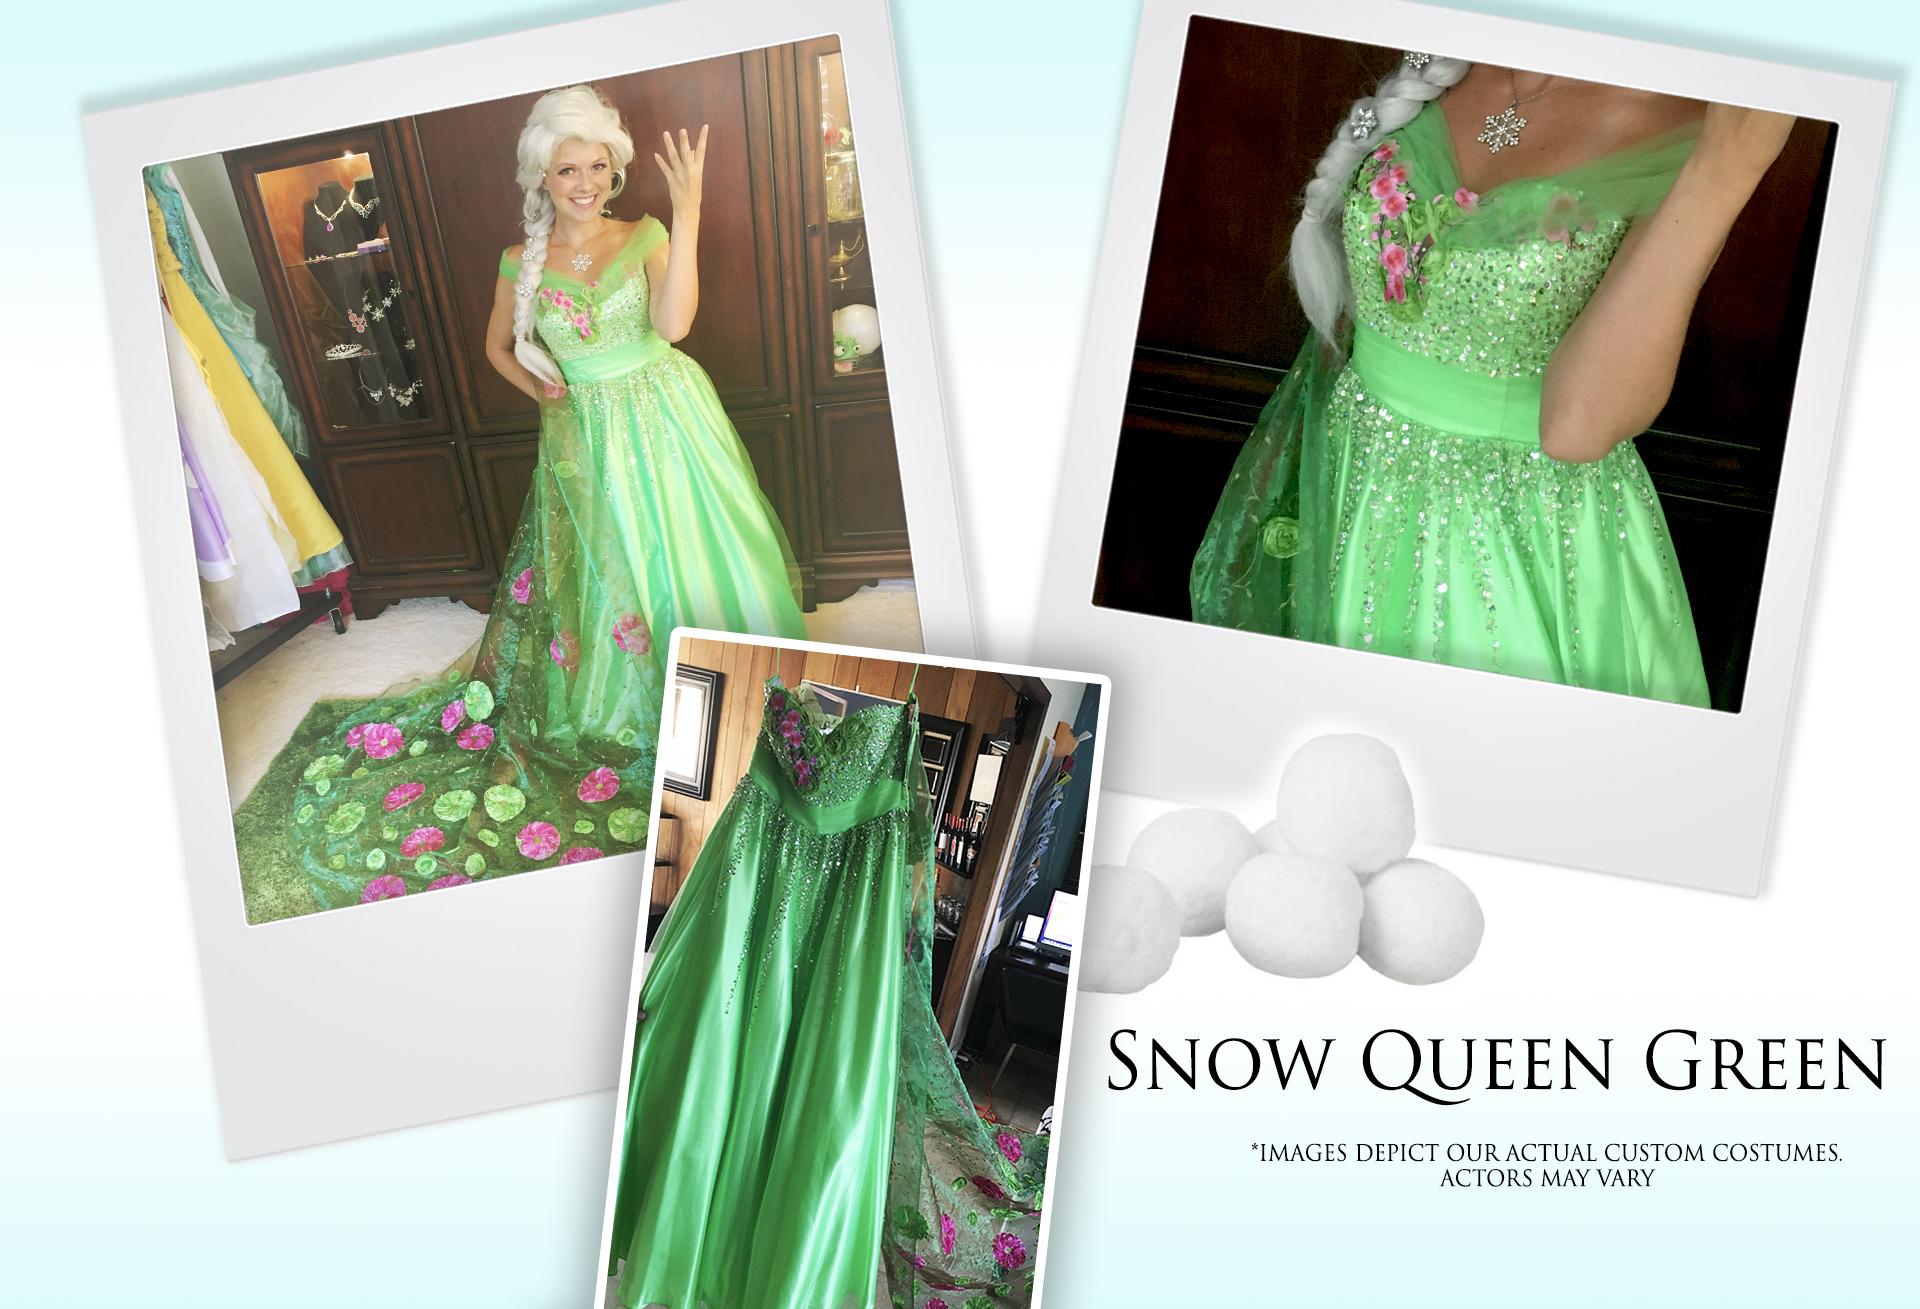 Snow Queen Green